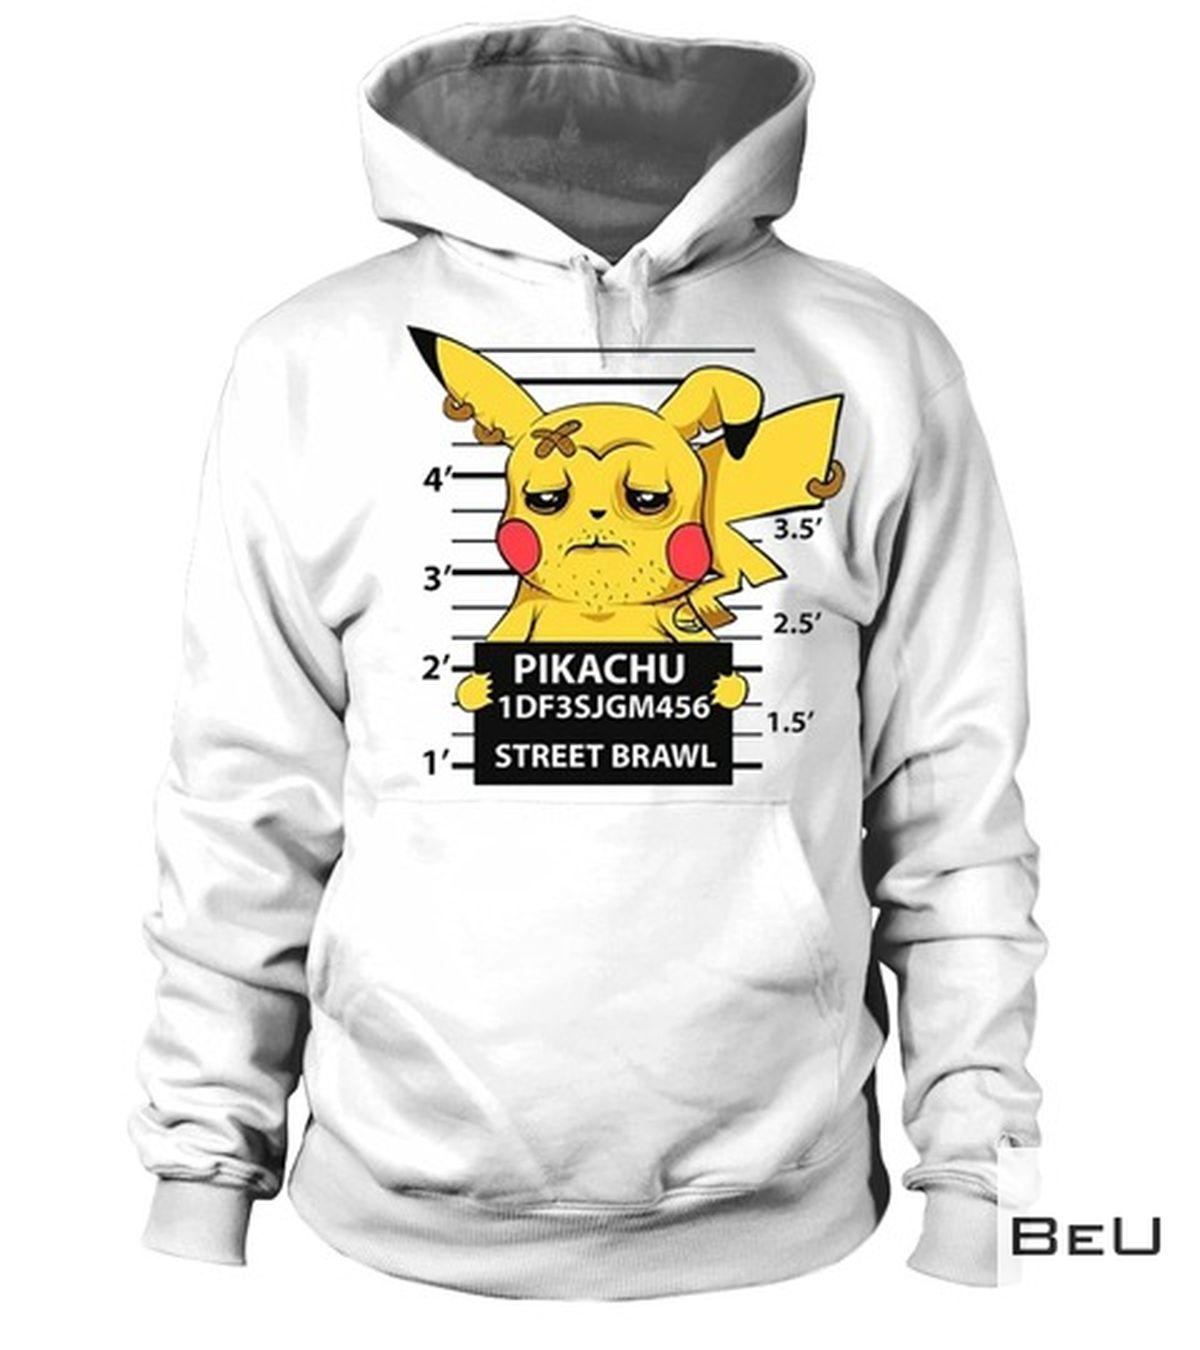 Very Good Quality Pokemon Pikachu Criminal Picture Shirt, hoodie, tank top